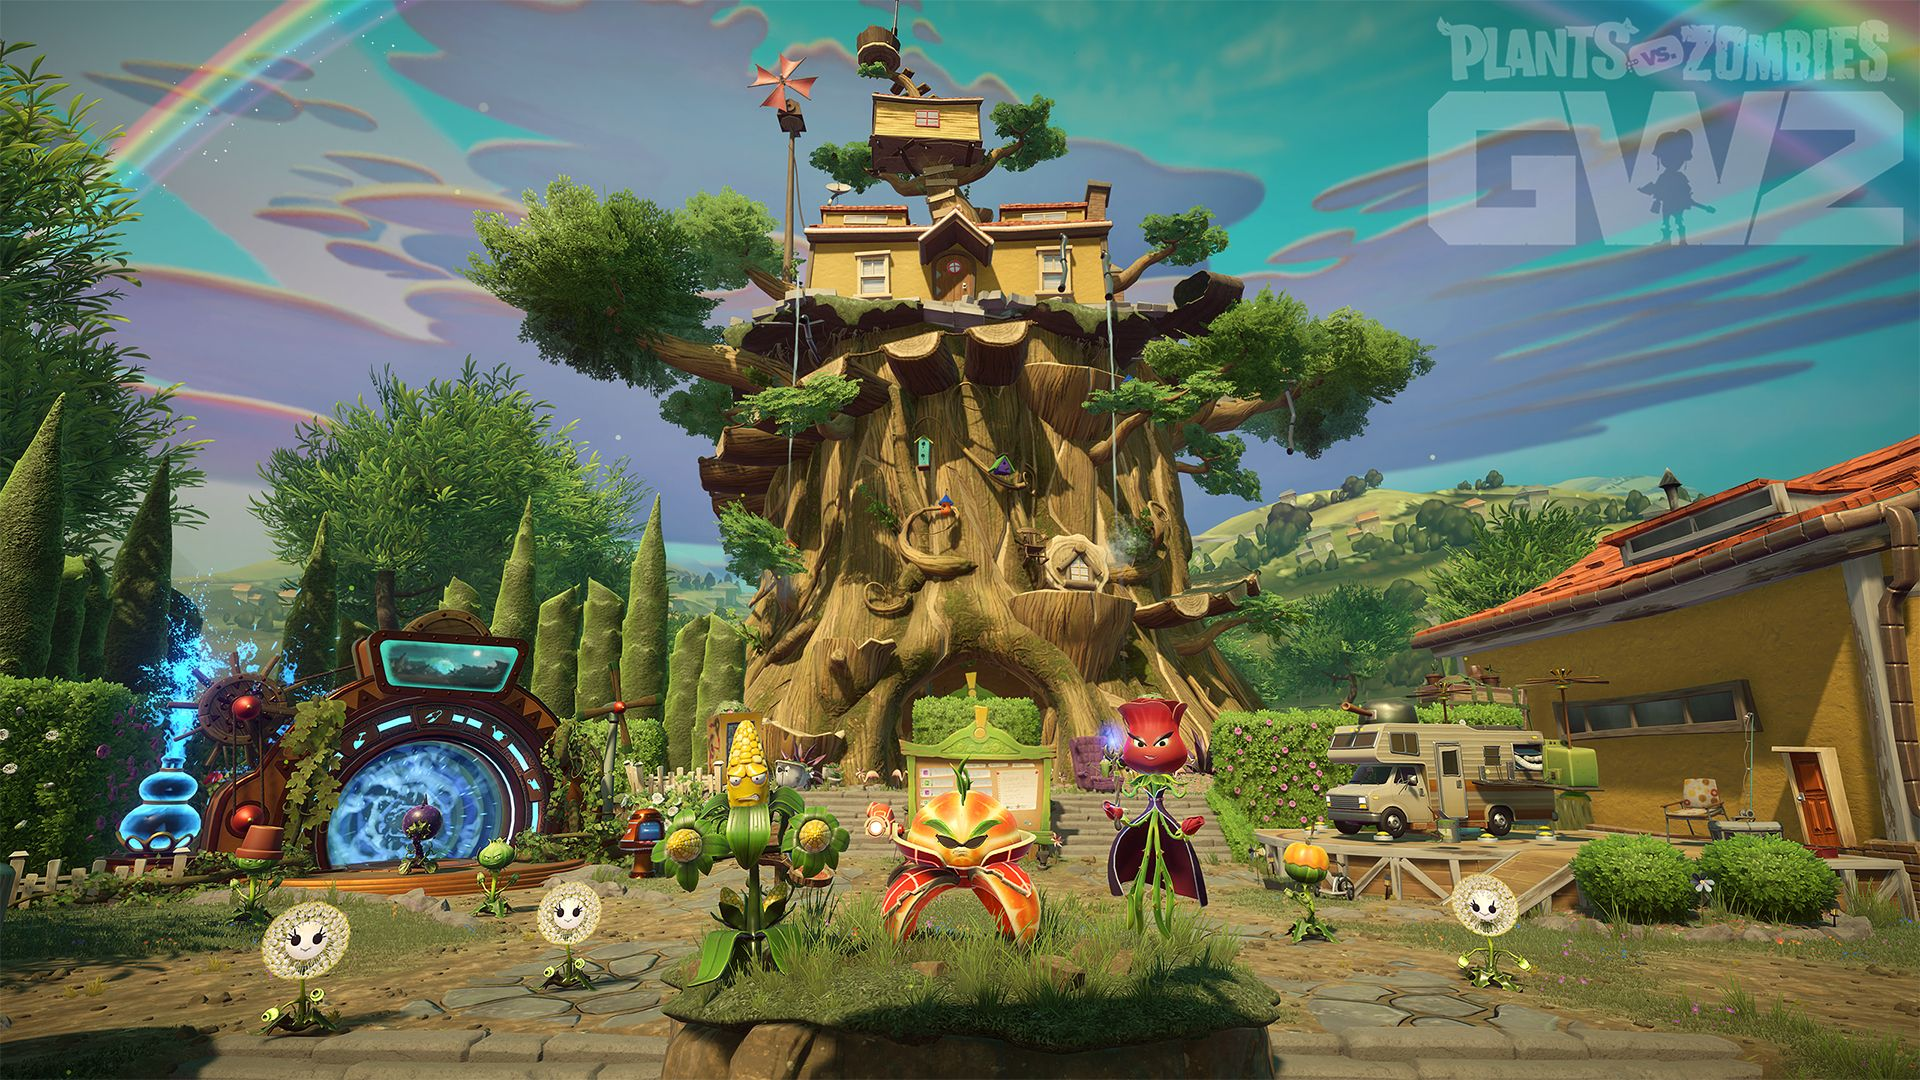 Plants Vs Zombies Garden Warfare 2 Introduces More Ways To Play With New Backyard Battleground Zombies Capturas De Tela Tower Defense